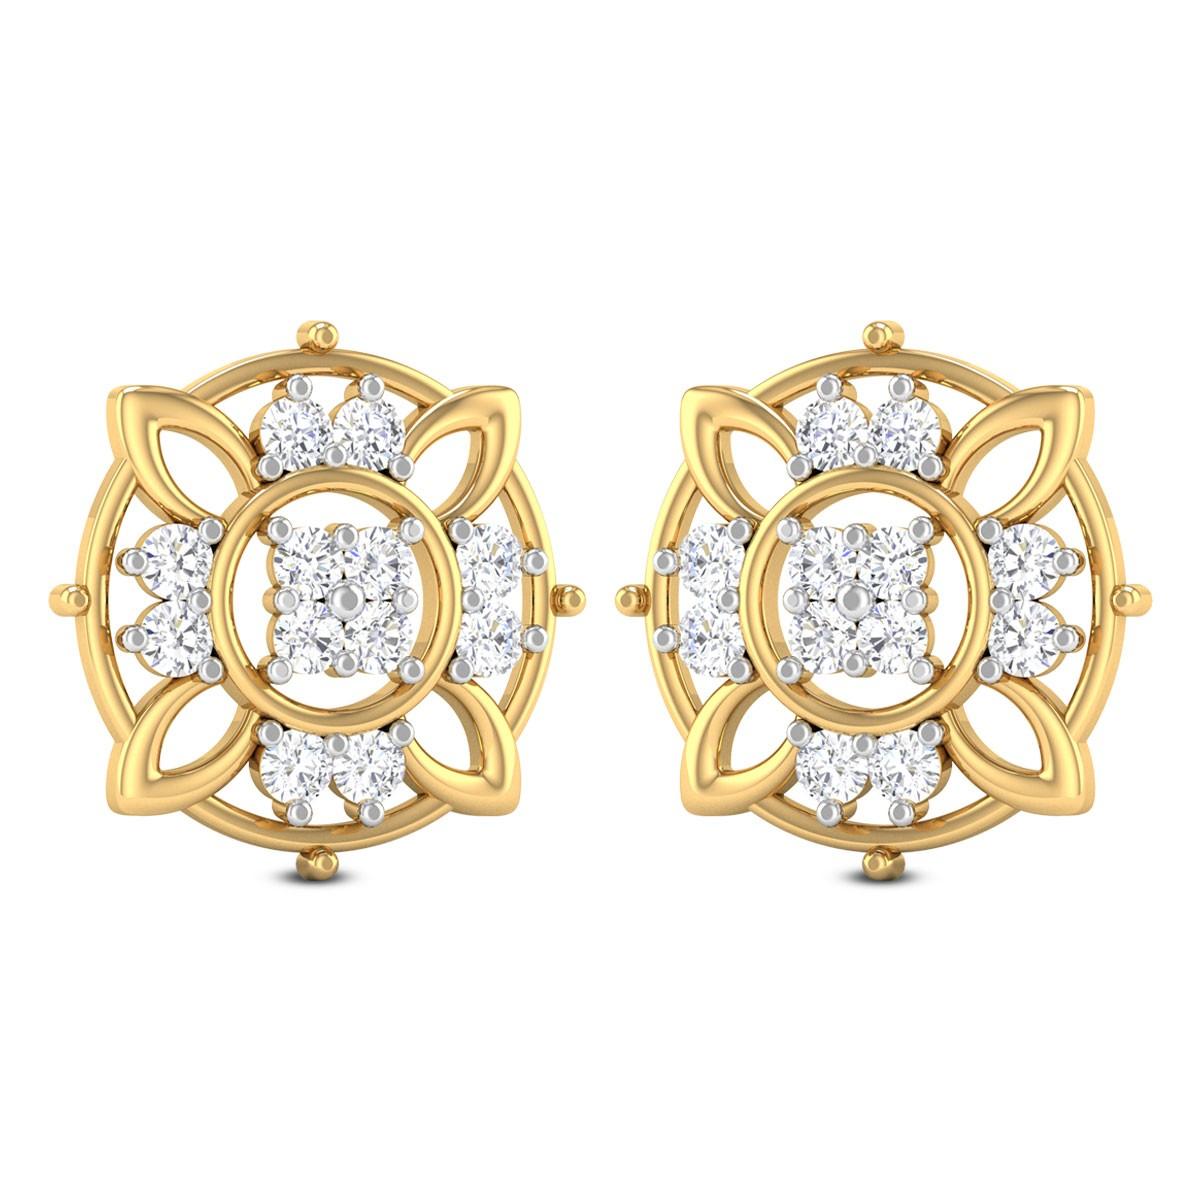 Elora Floral Diamond Stud Earrings